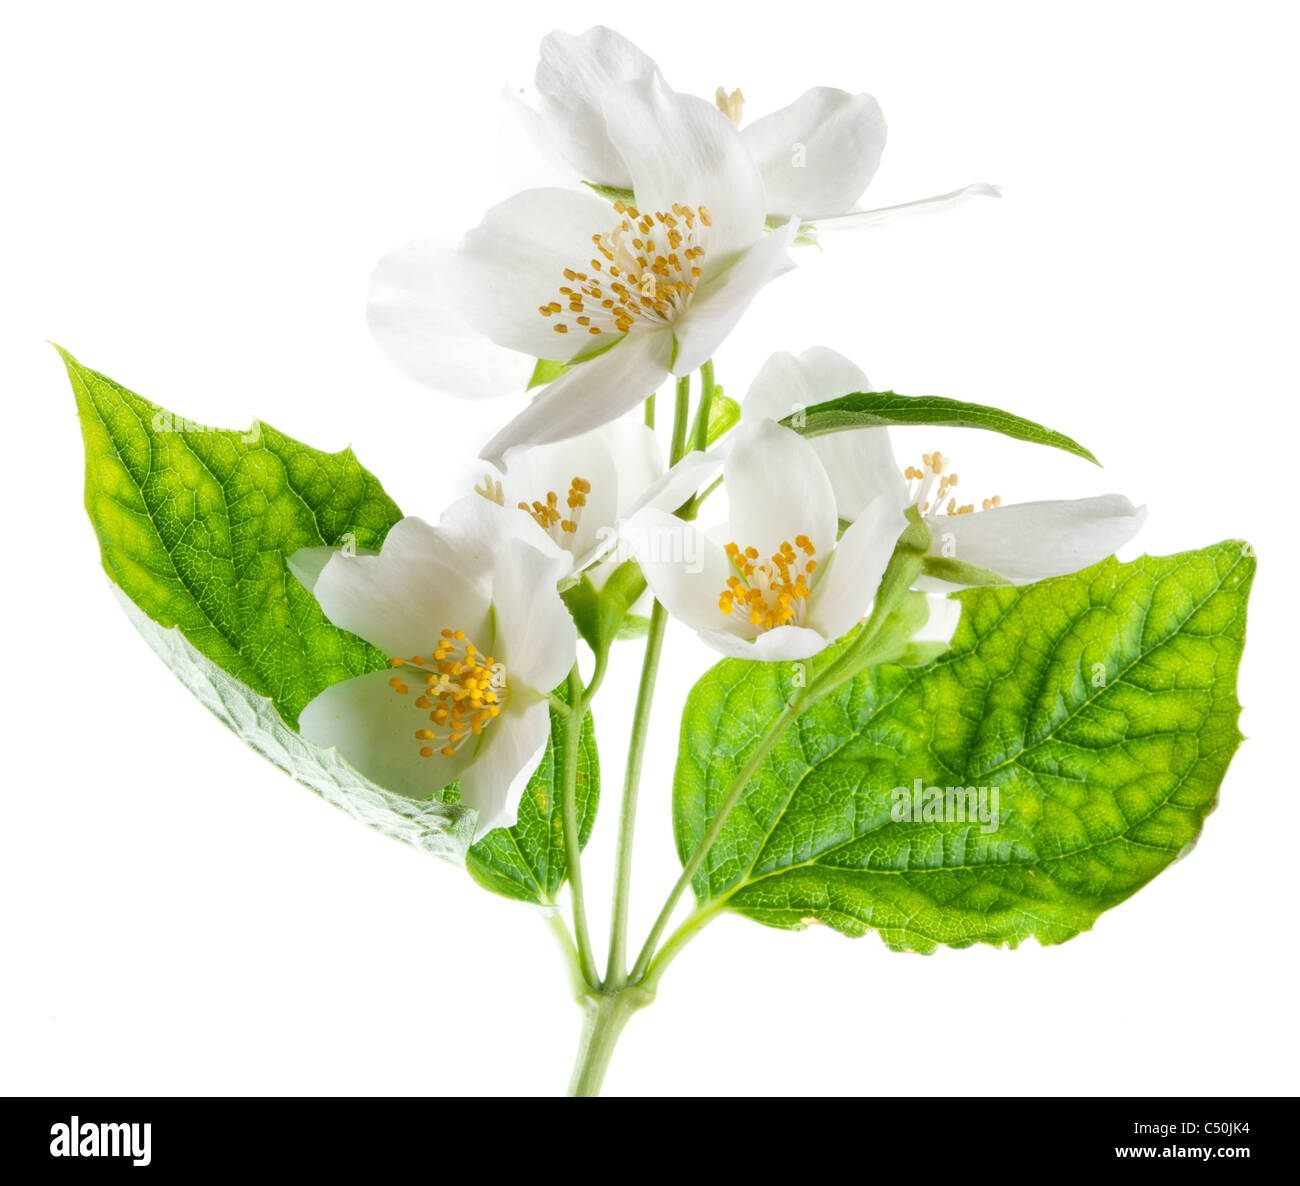 Jasmine flowers isolated on a white background. - Stock Image